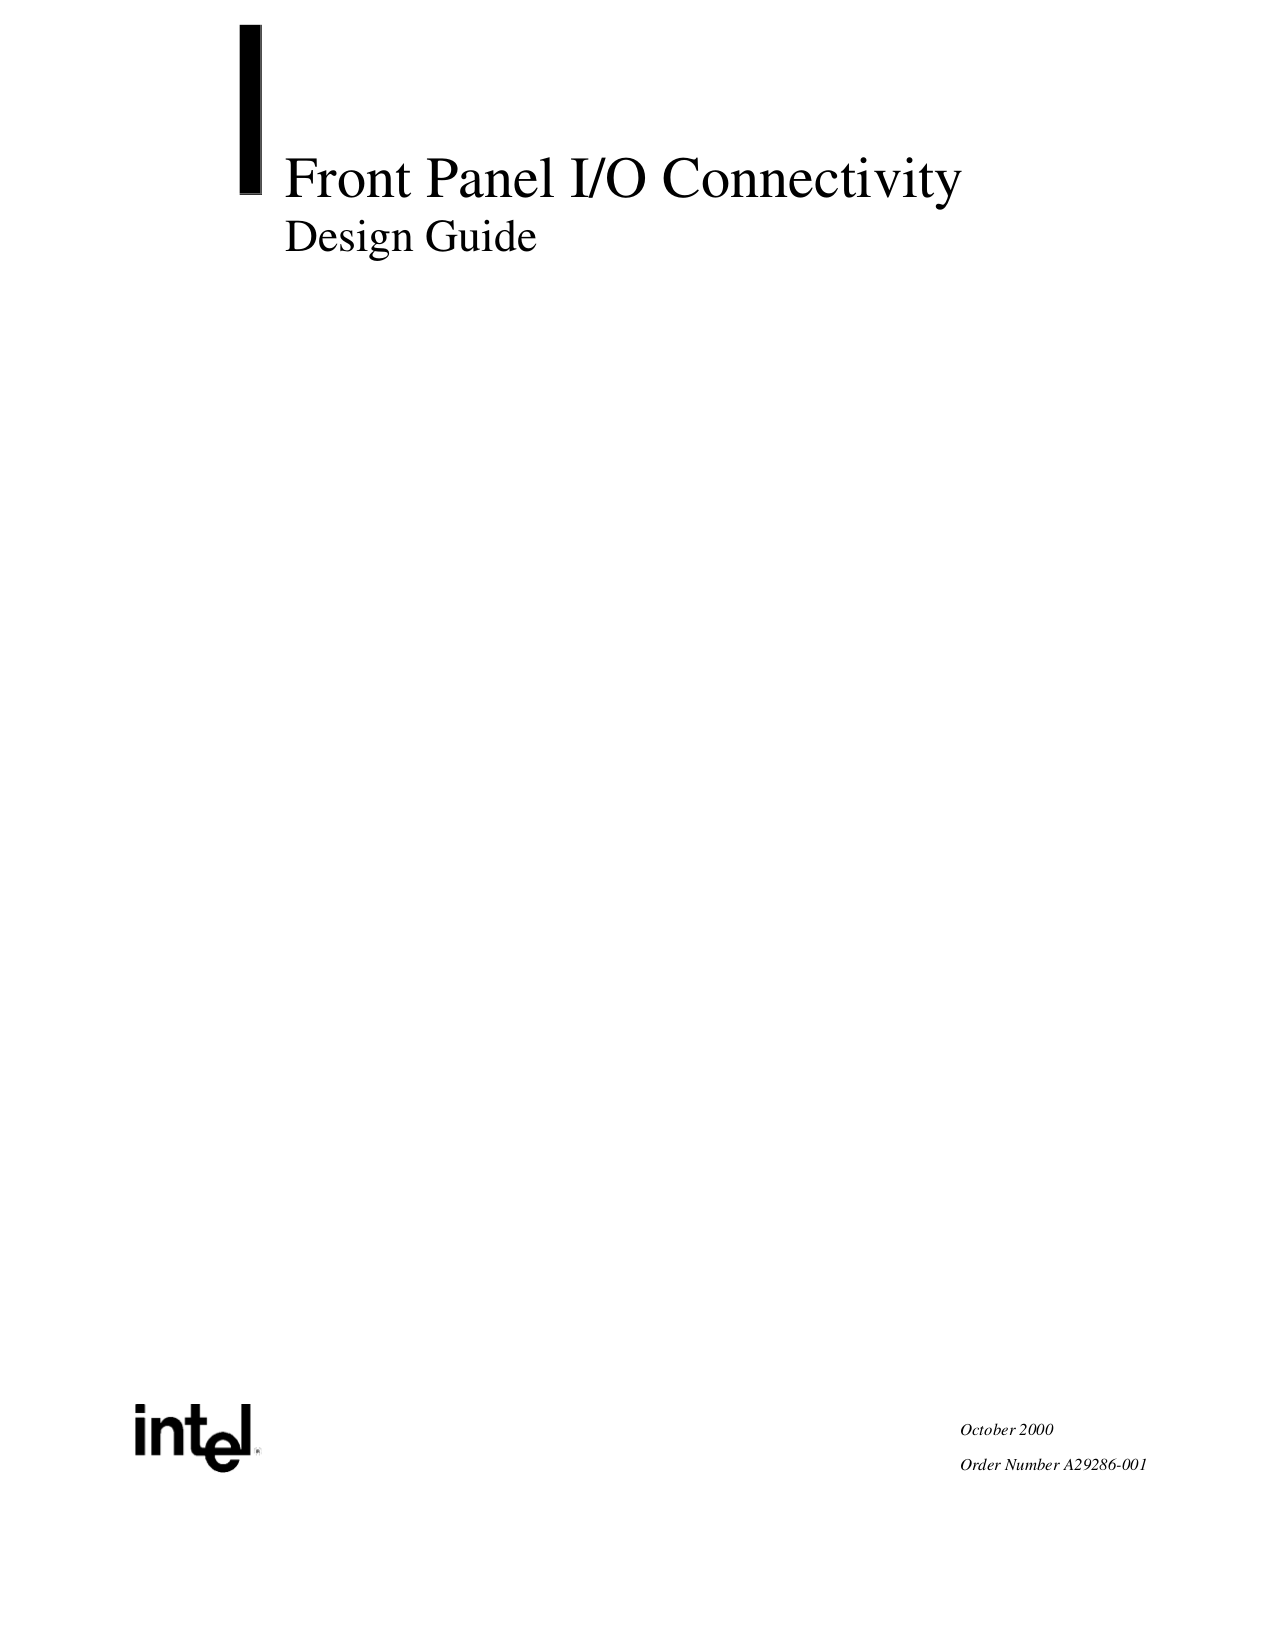 pdf for Lenovo Desktop ThinkCentre M55e 9632 manual